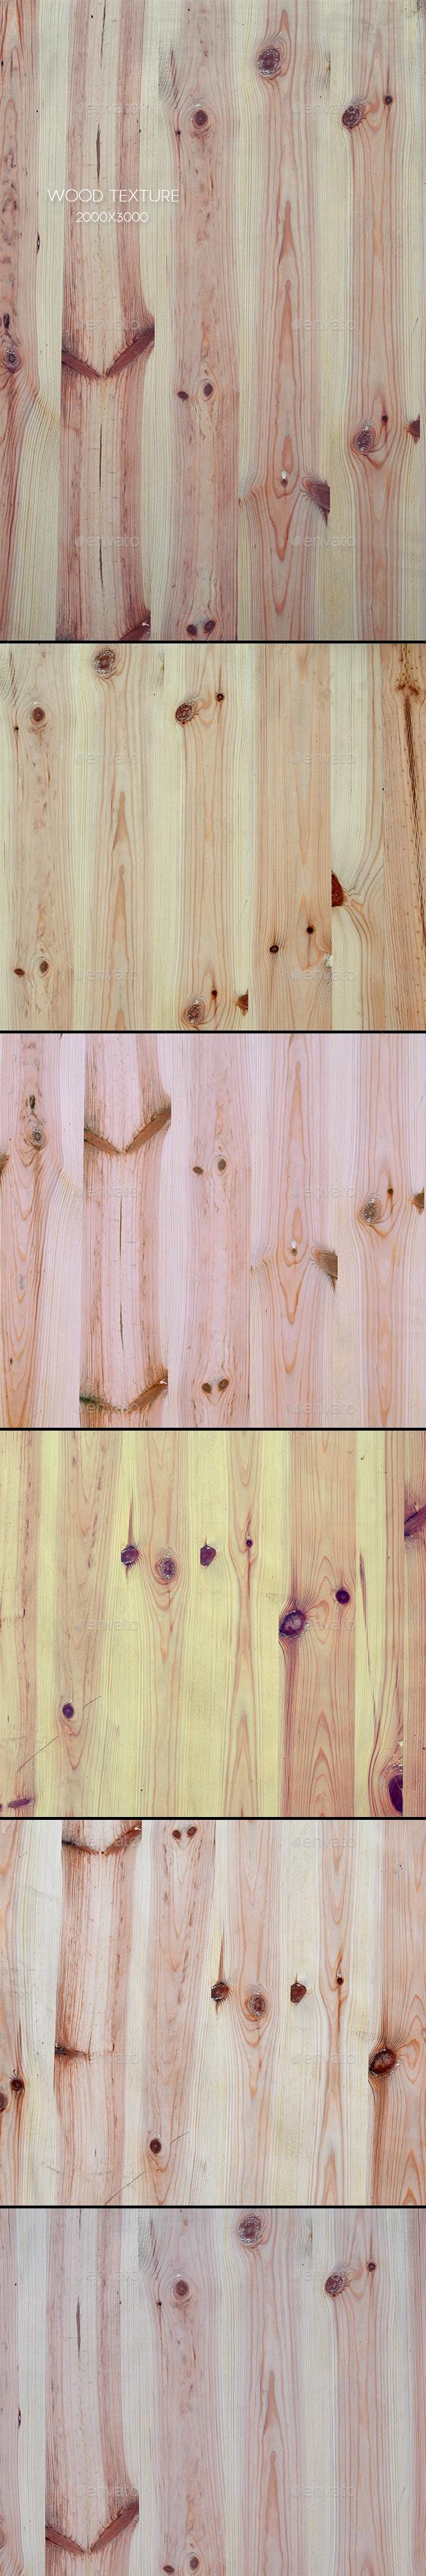 Wood Texture.4 - Wood Textures